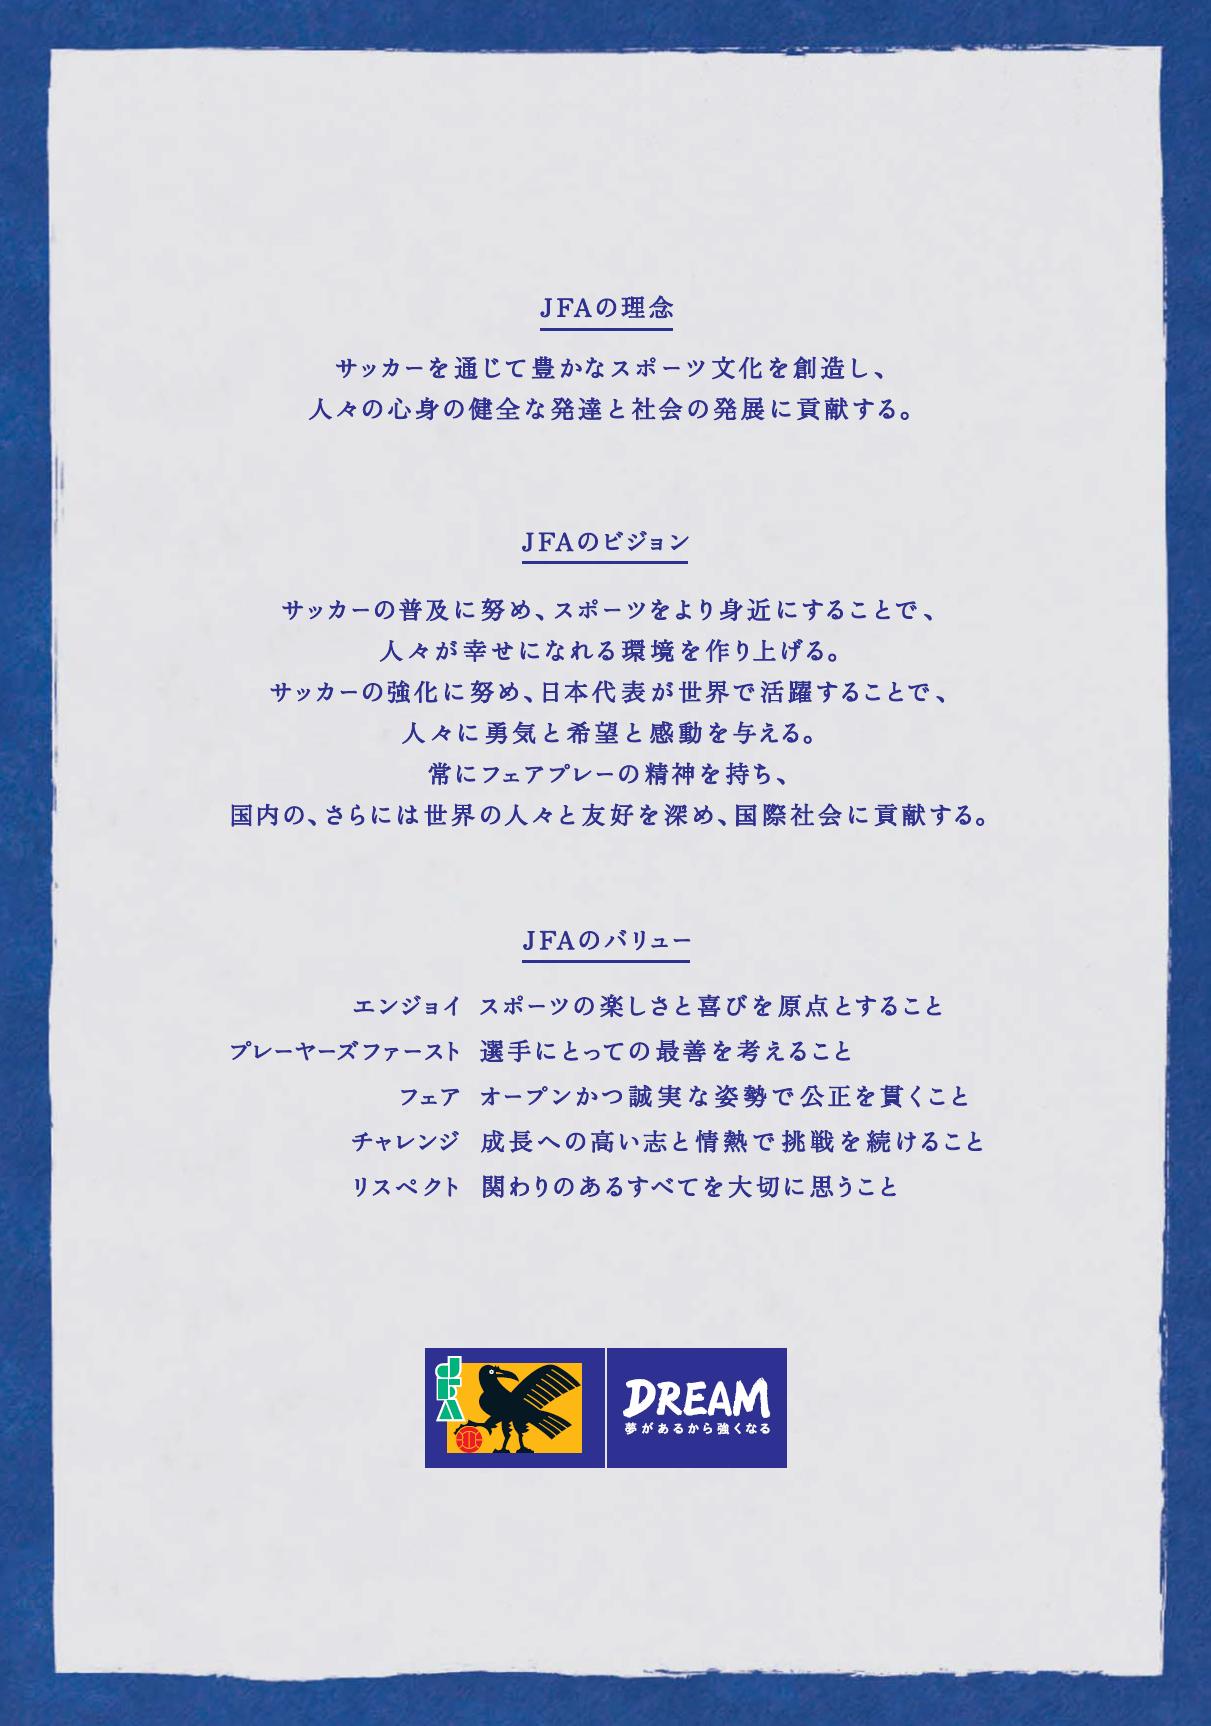 JFAの理念・ビジョン・バリュー.png